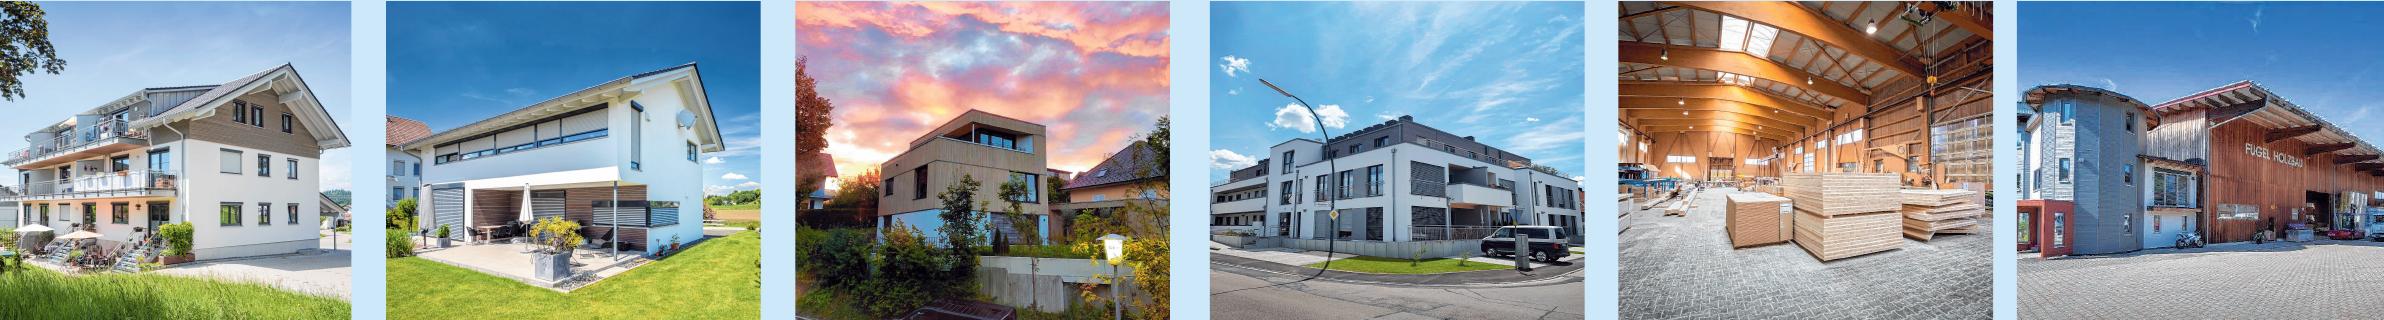 Holzbau Fugel: Holzhäuser bieten Wohlfühlatmosphäre Image 1